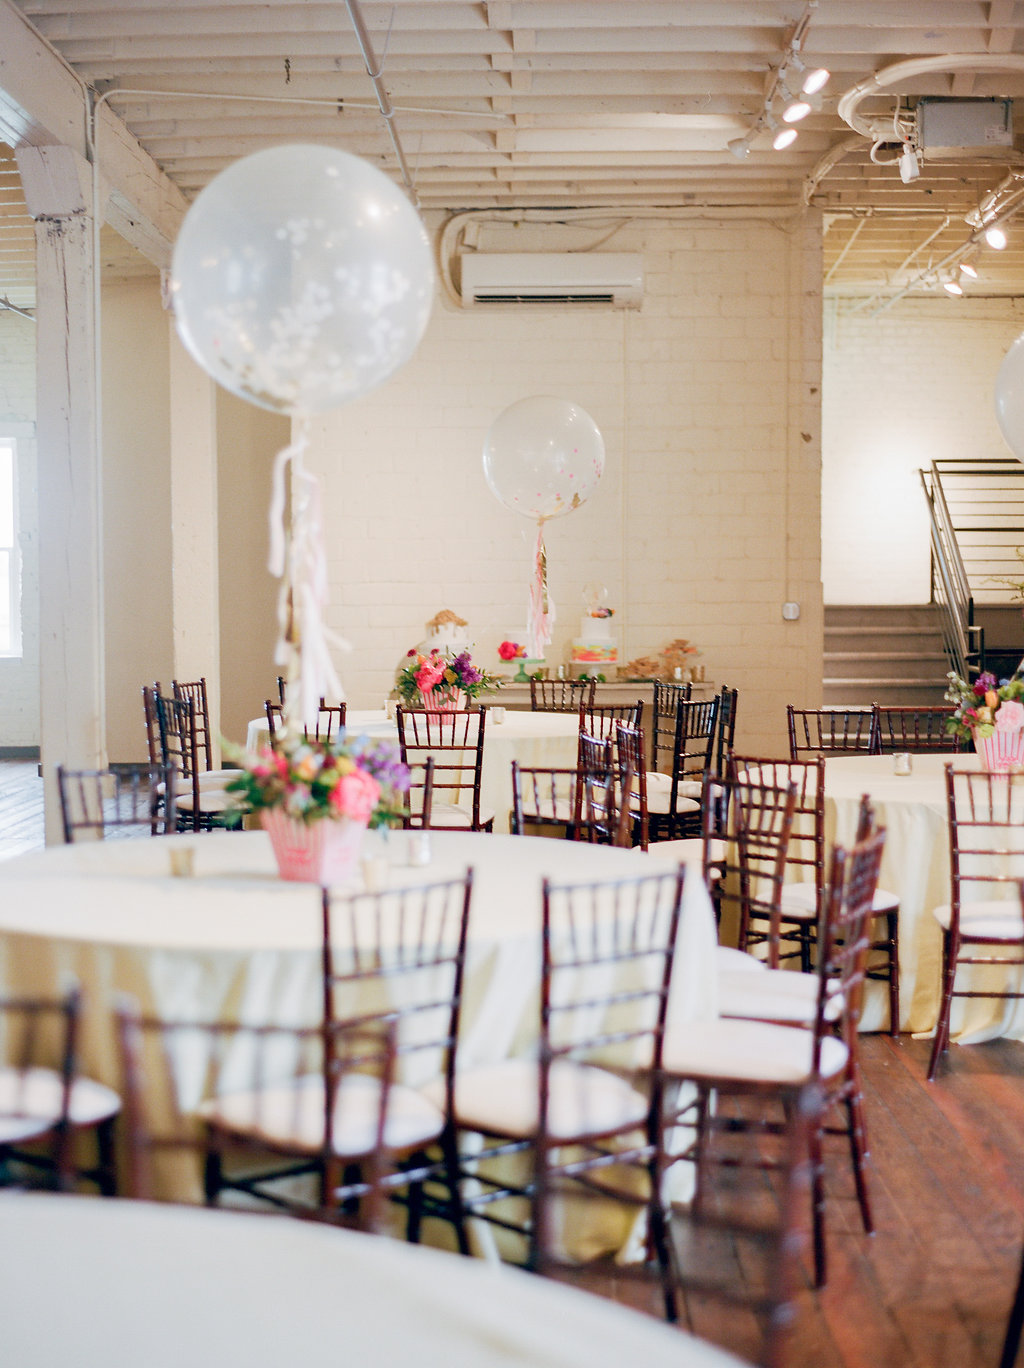 modern playful wedding ideas with balloons - https://ruffledblog.com/modern-playful-texas-carnival-wedding